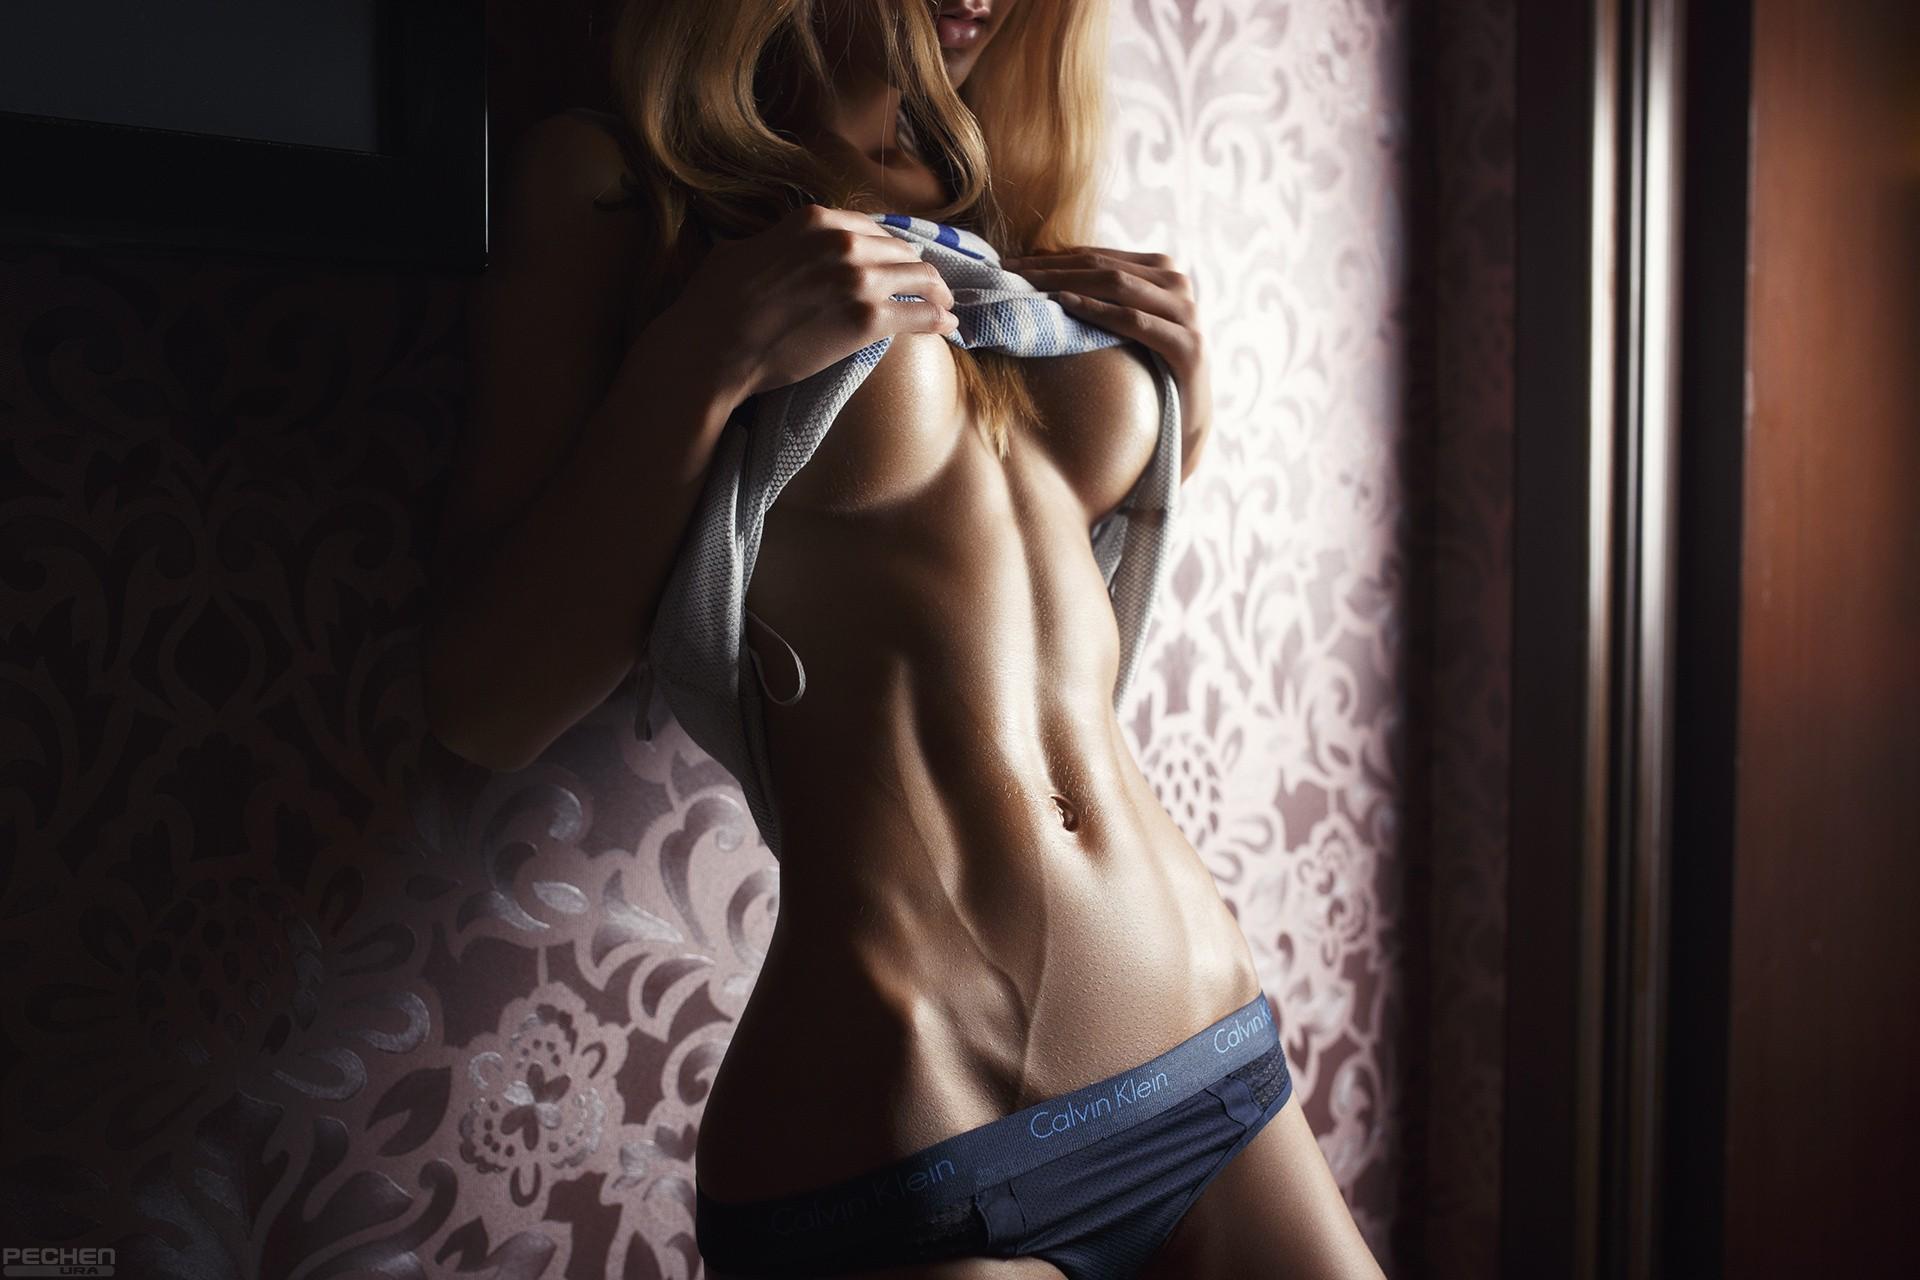 pec grlis sex vidieo